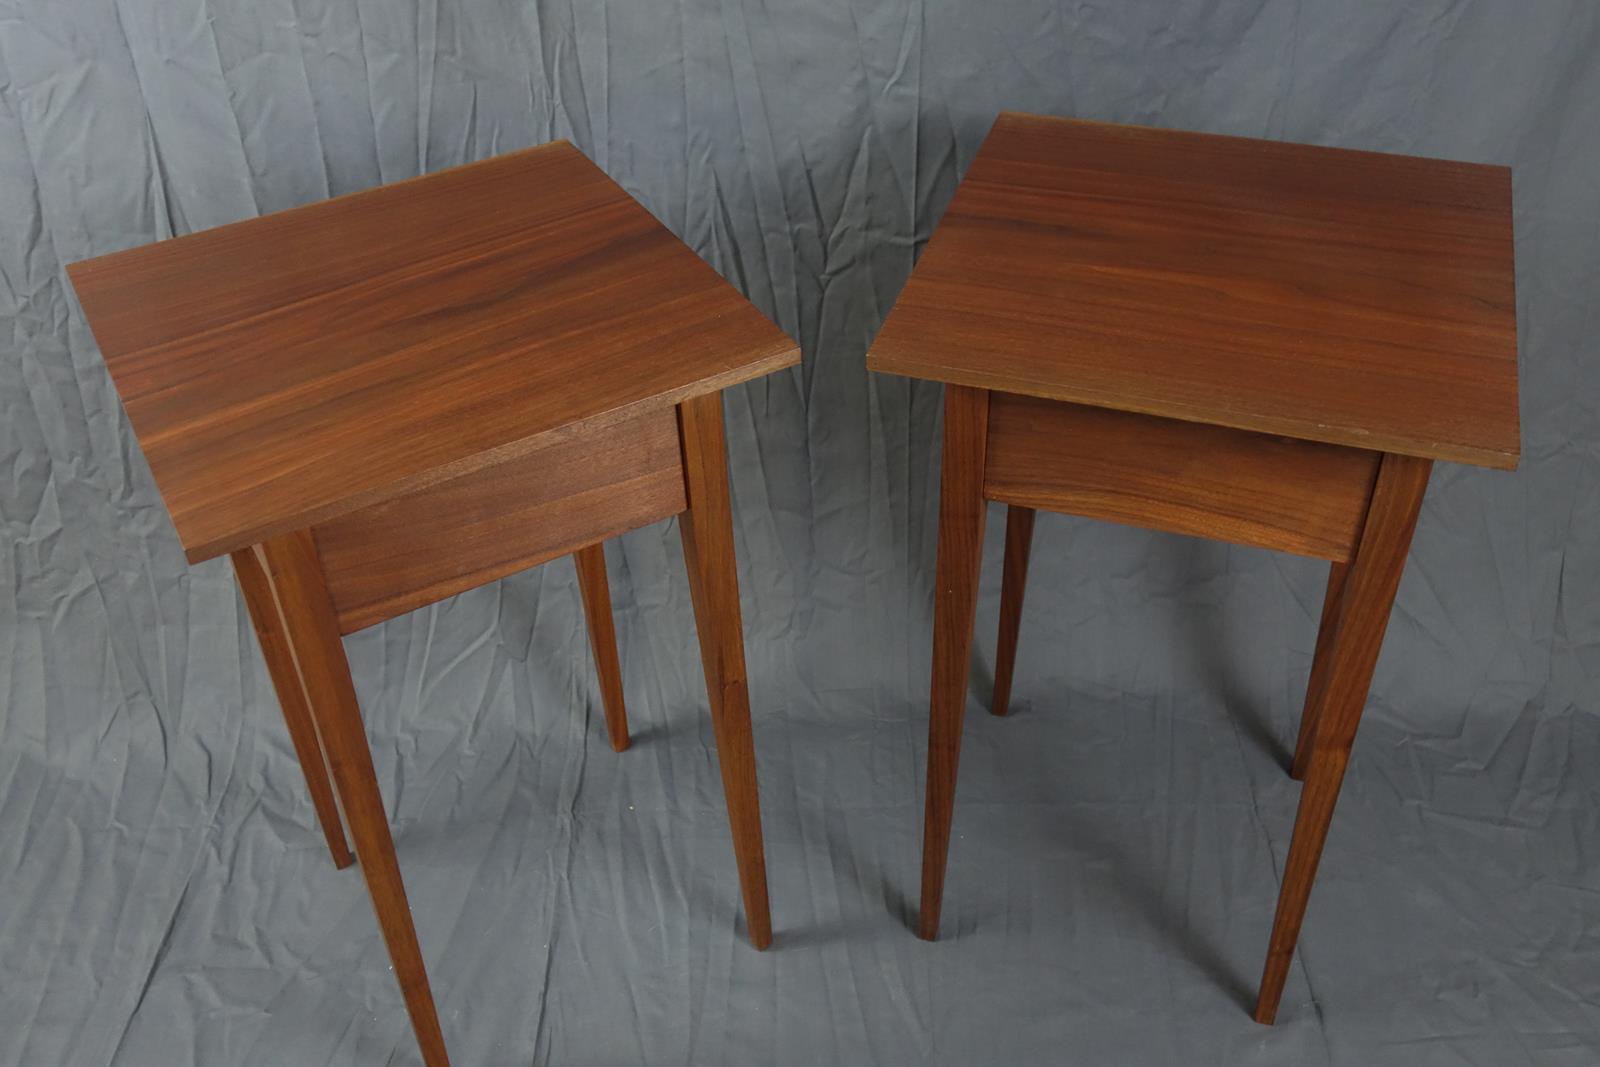 Walnut shaker table